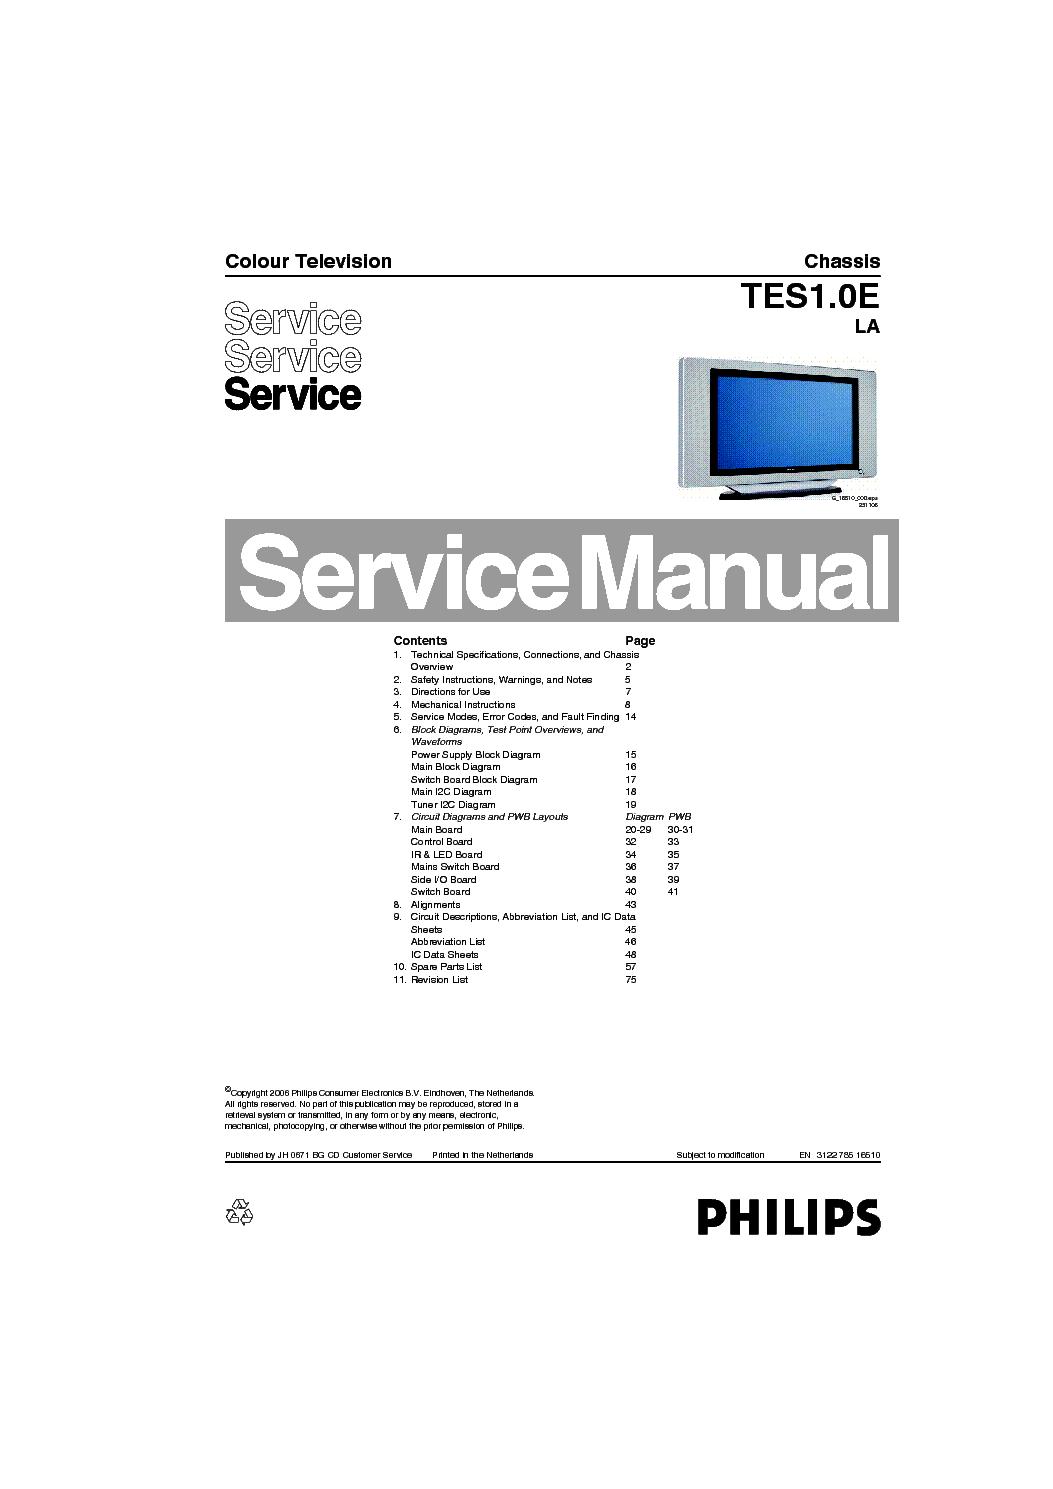 Philips Tc8 1l Ca Service Manual Download Schematics